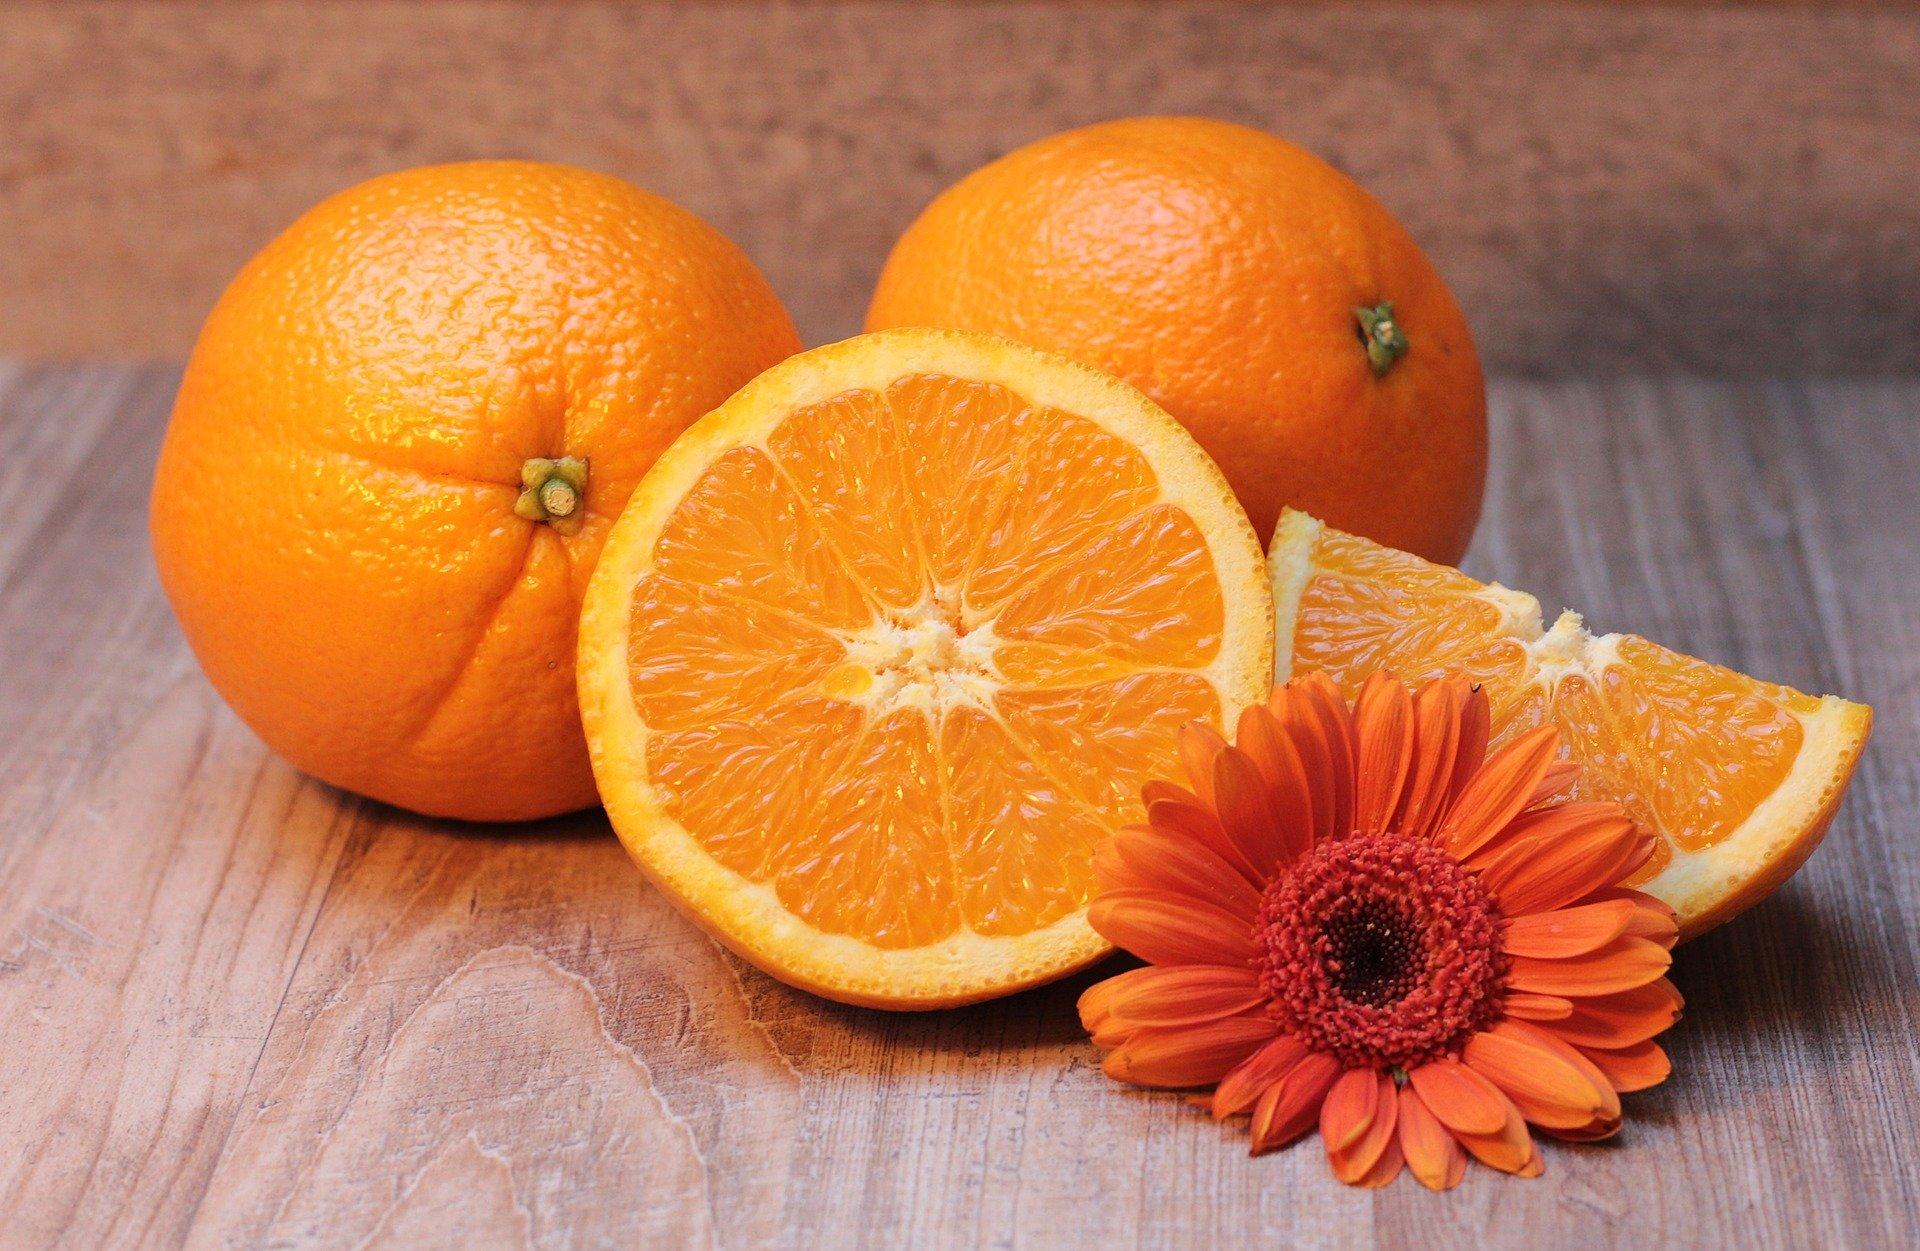 Orange, rich in folic acid